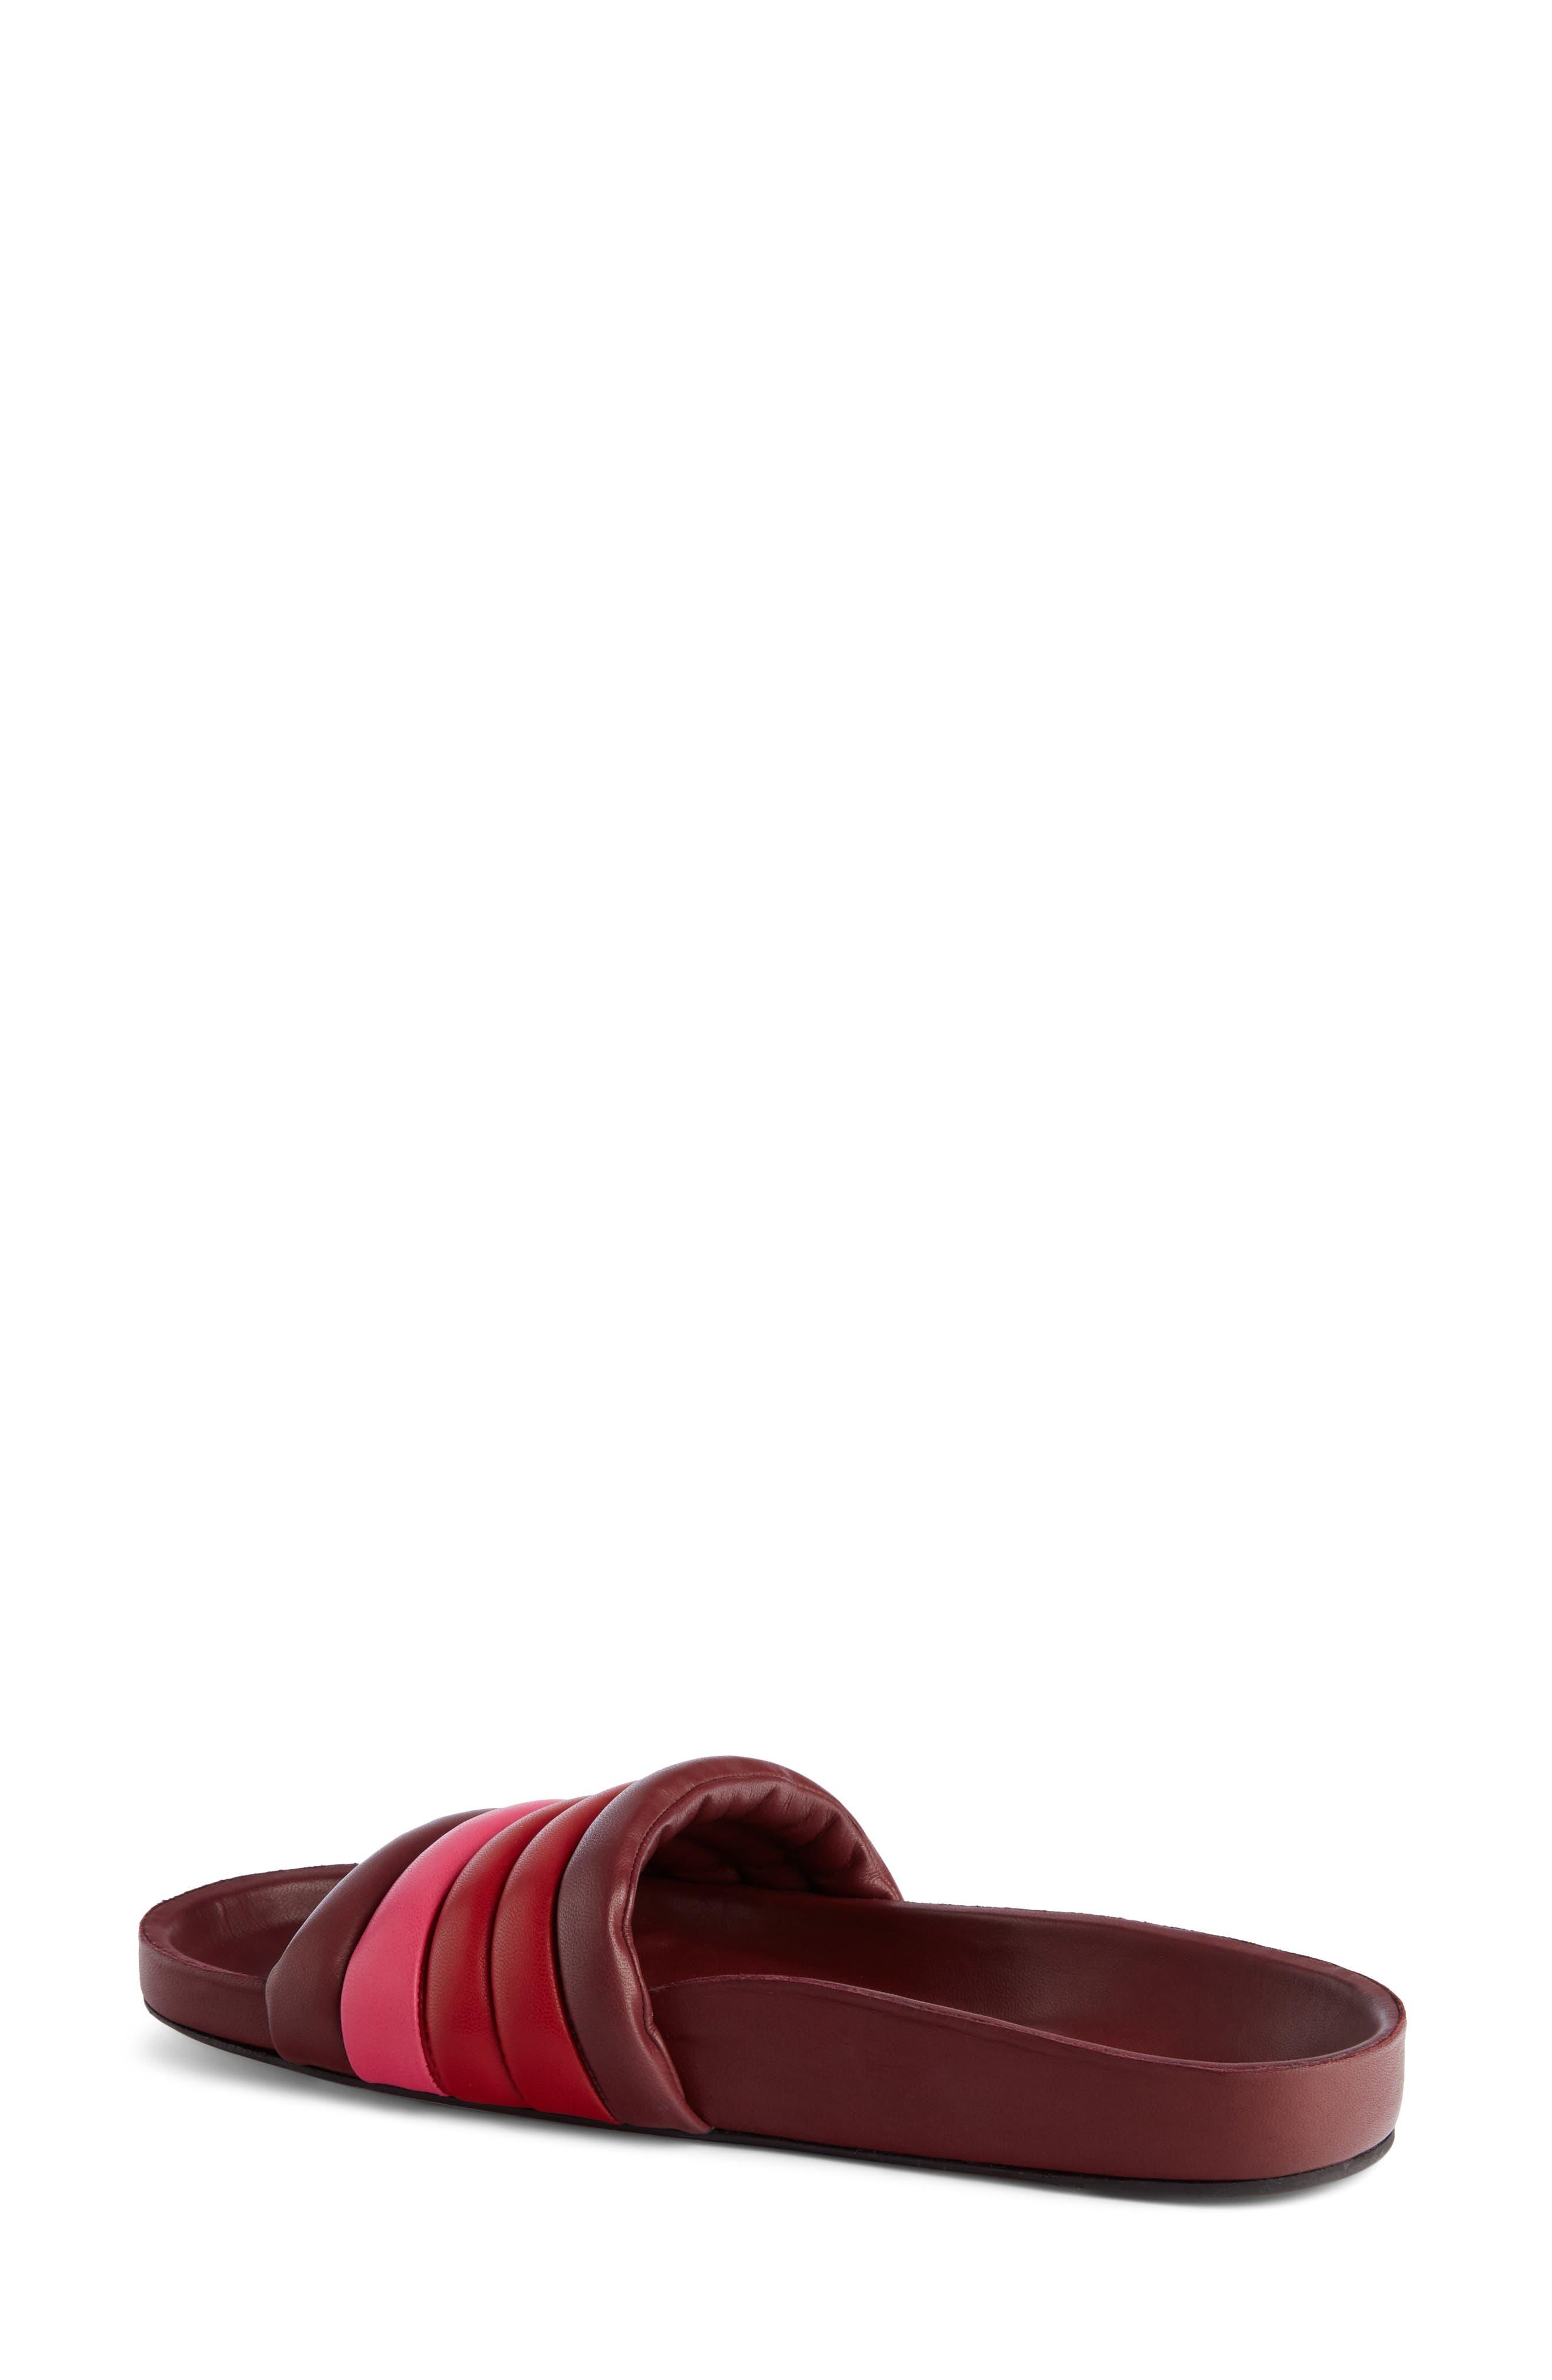 Hellea Slide Sandal,                             Alternate thumbnail 4, color,